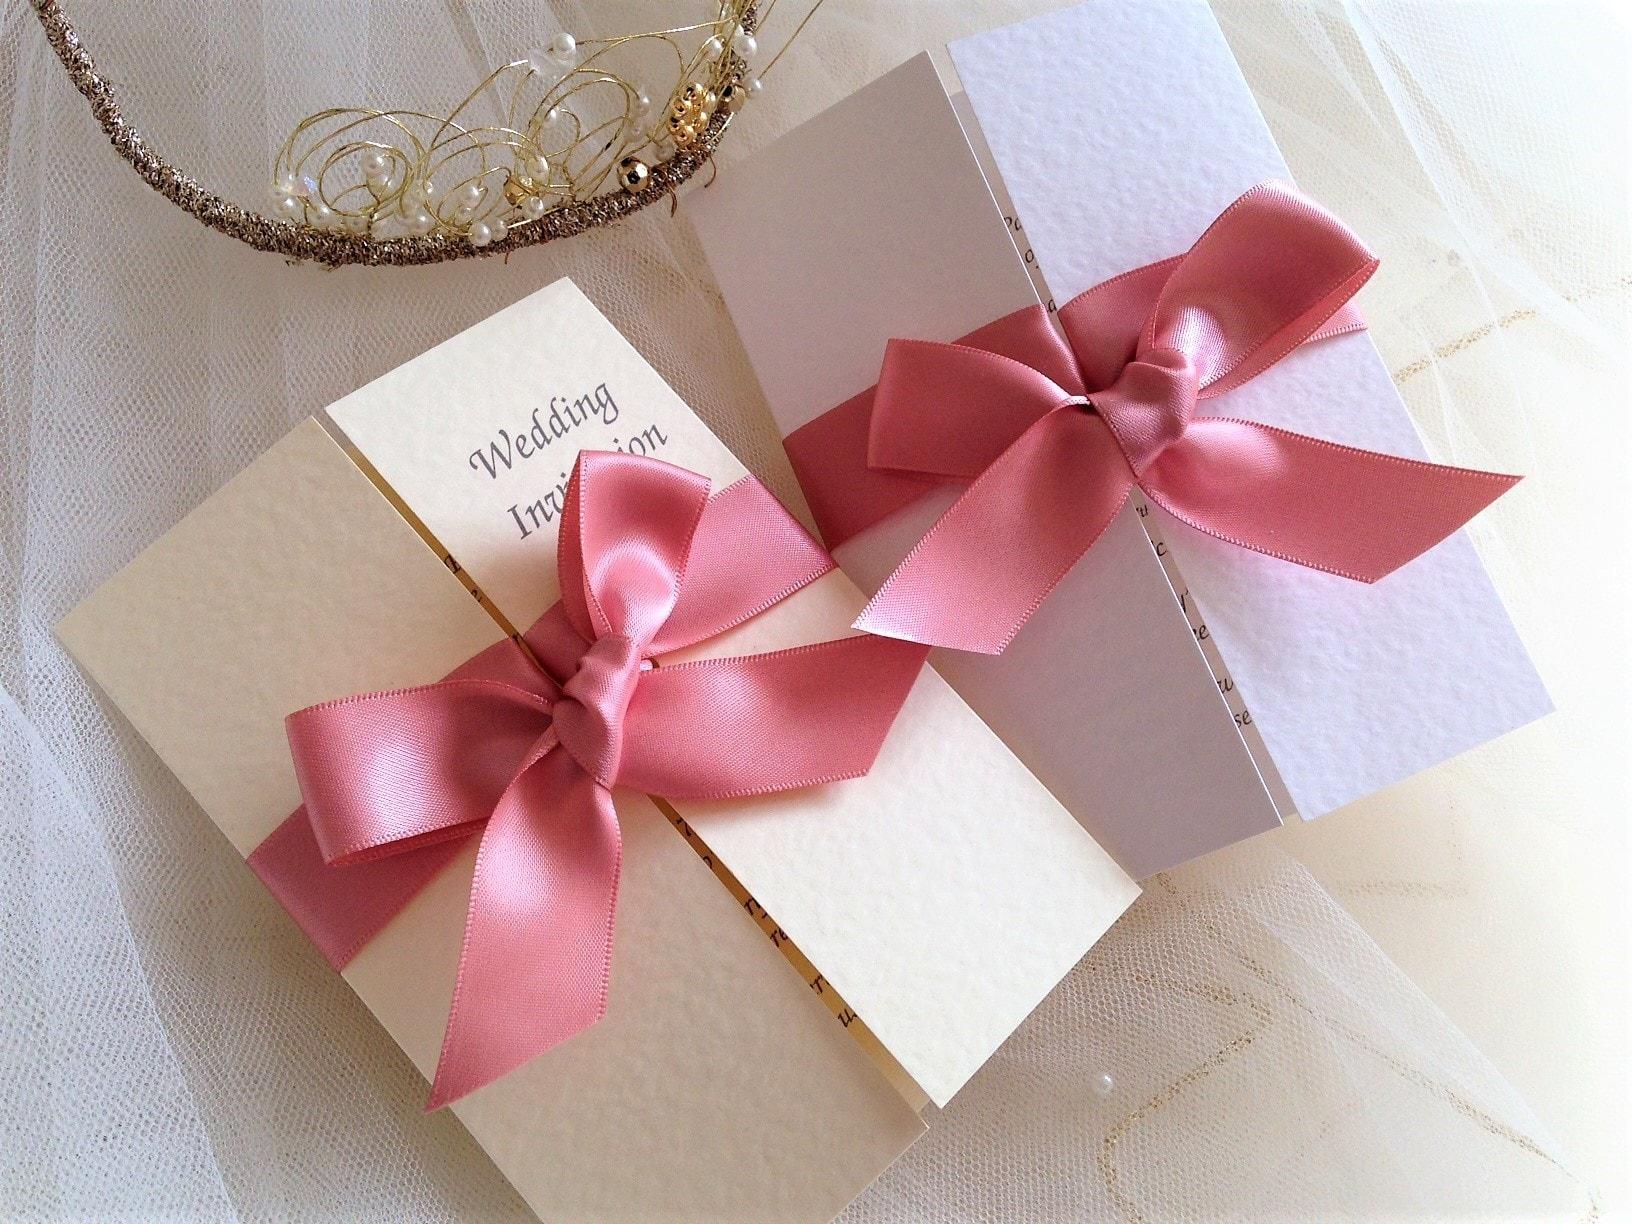 Gatefold Wedding Invitations - Daisy Chain Invites